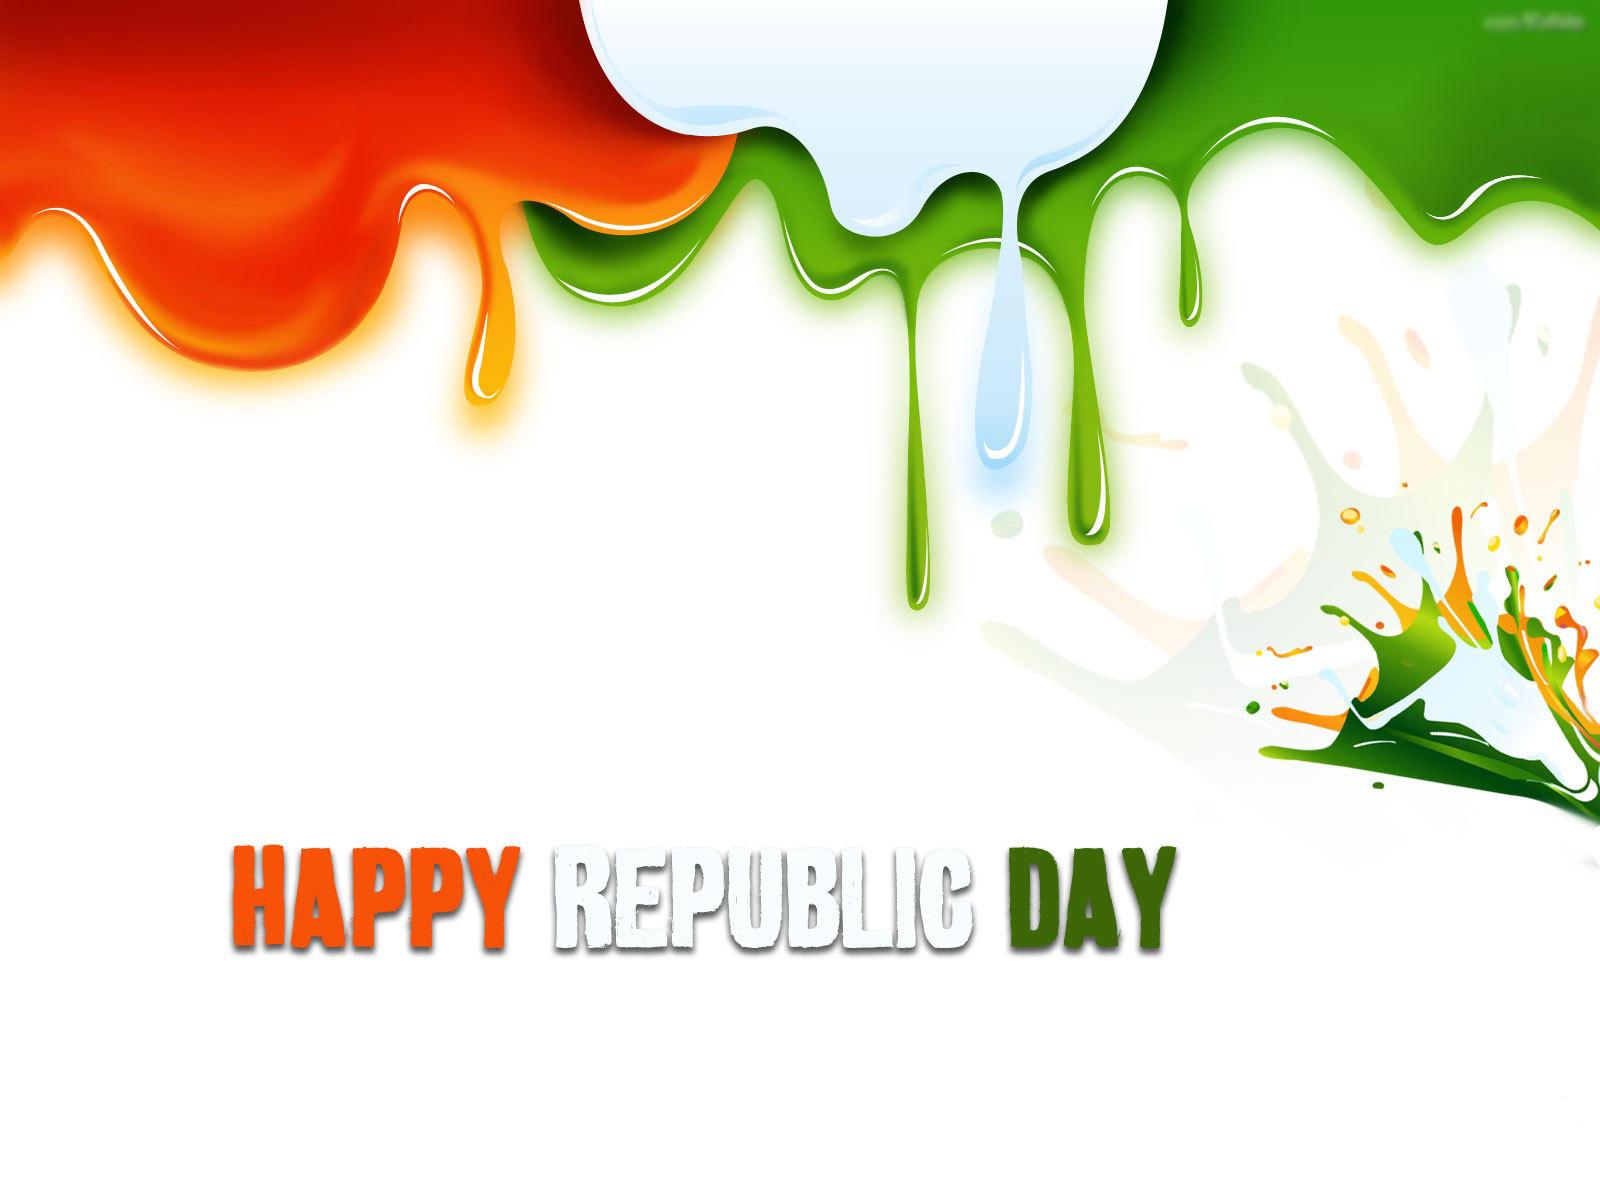 http://4.bp.blogspot.com/-1xIJOS4XR1k/Tx4A0iCzAgI/AAAAAAAAF_8/xZE1EiPdq3c/s1600/happy_republic_day_12268.jpg